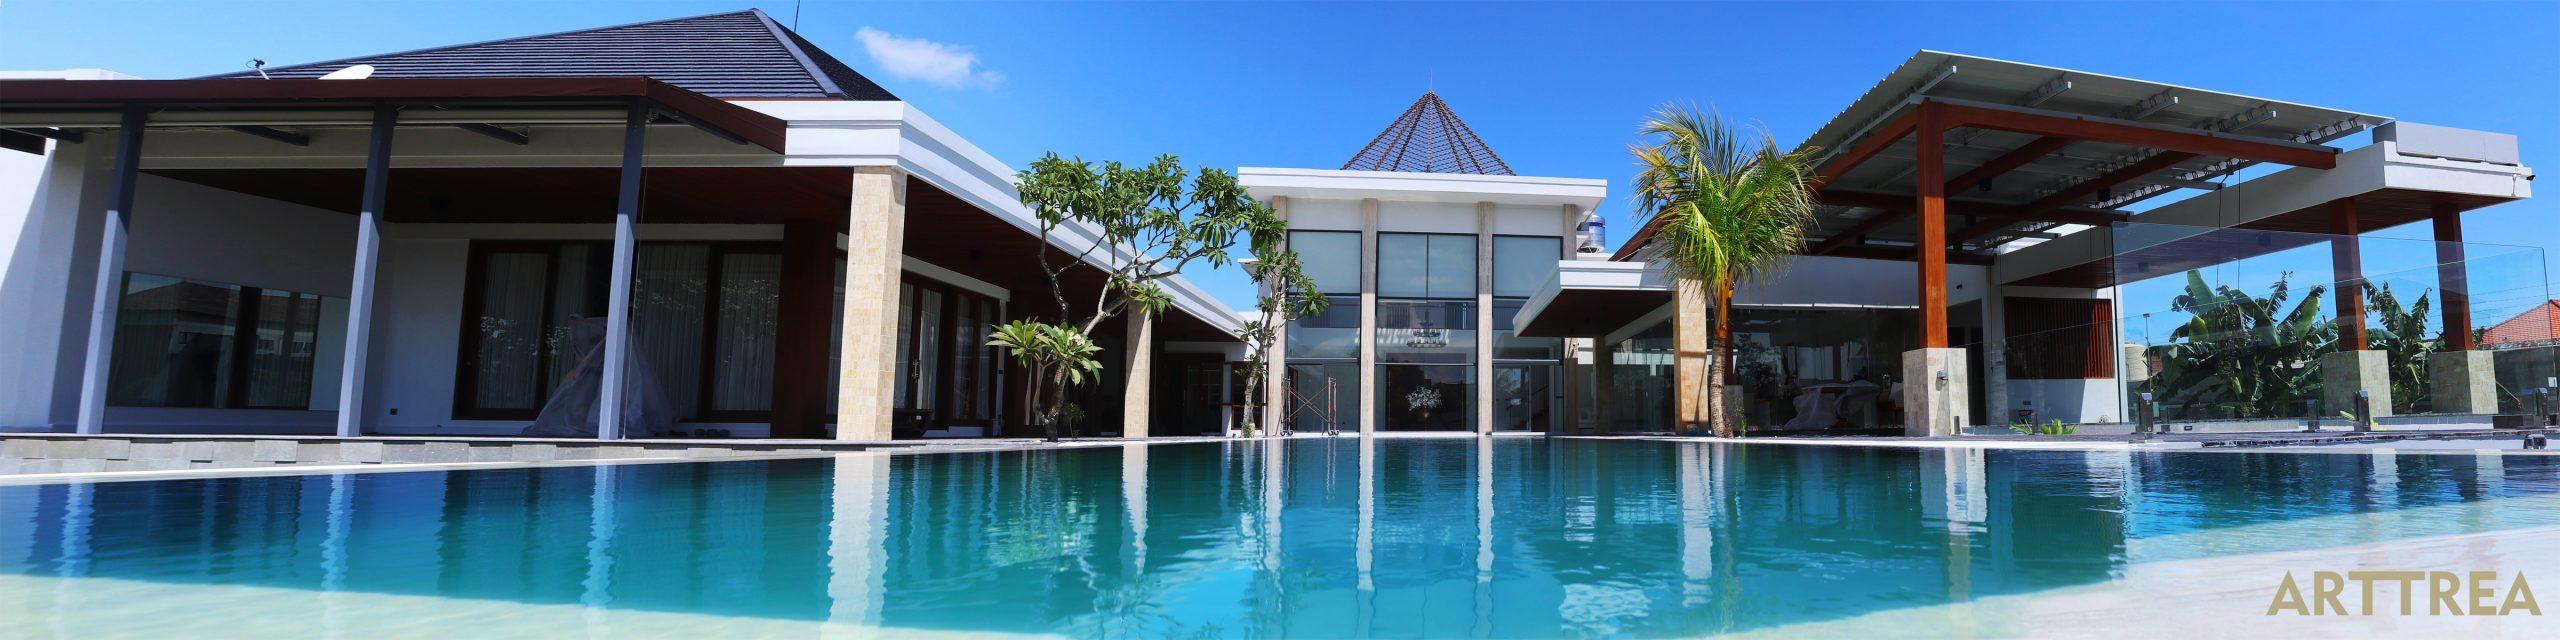 Dalung Villas Panorama enhc lite scaled - High Quality furnitures interior exterior